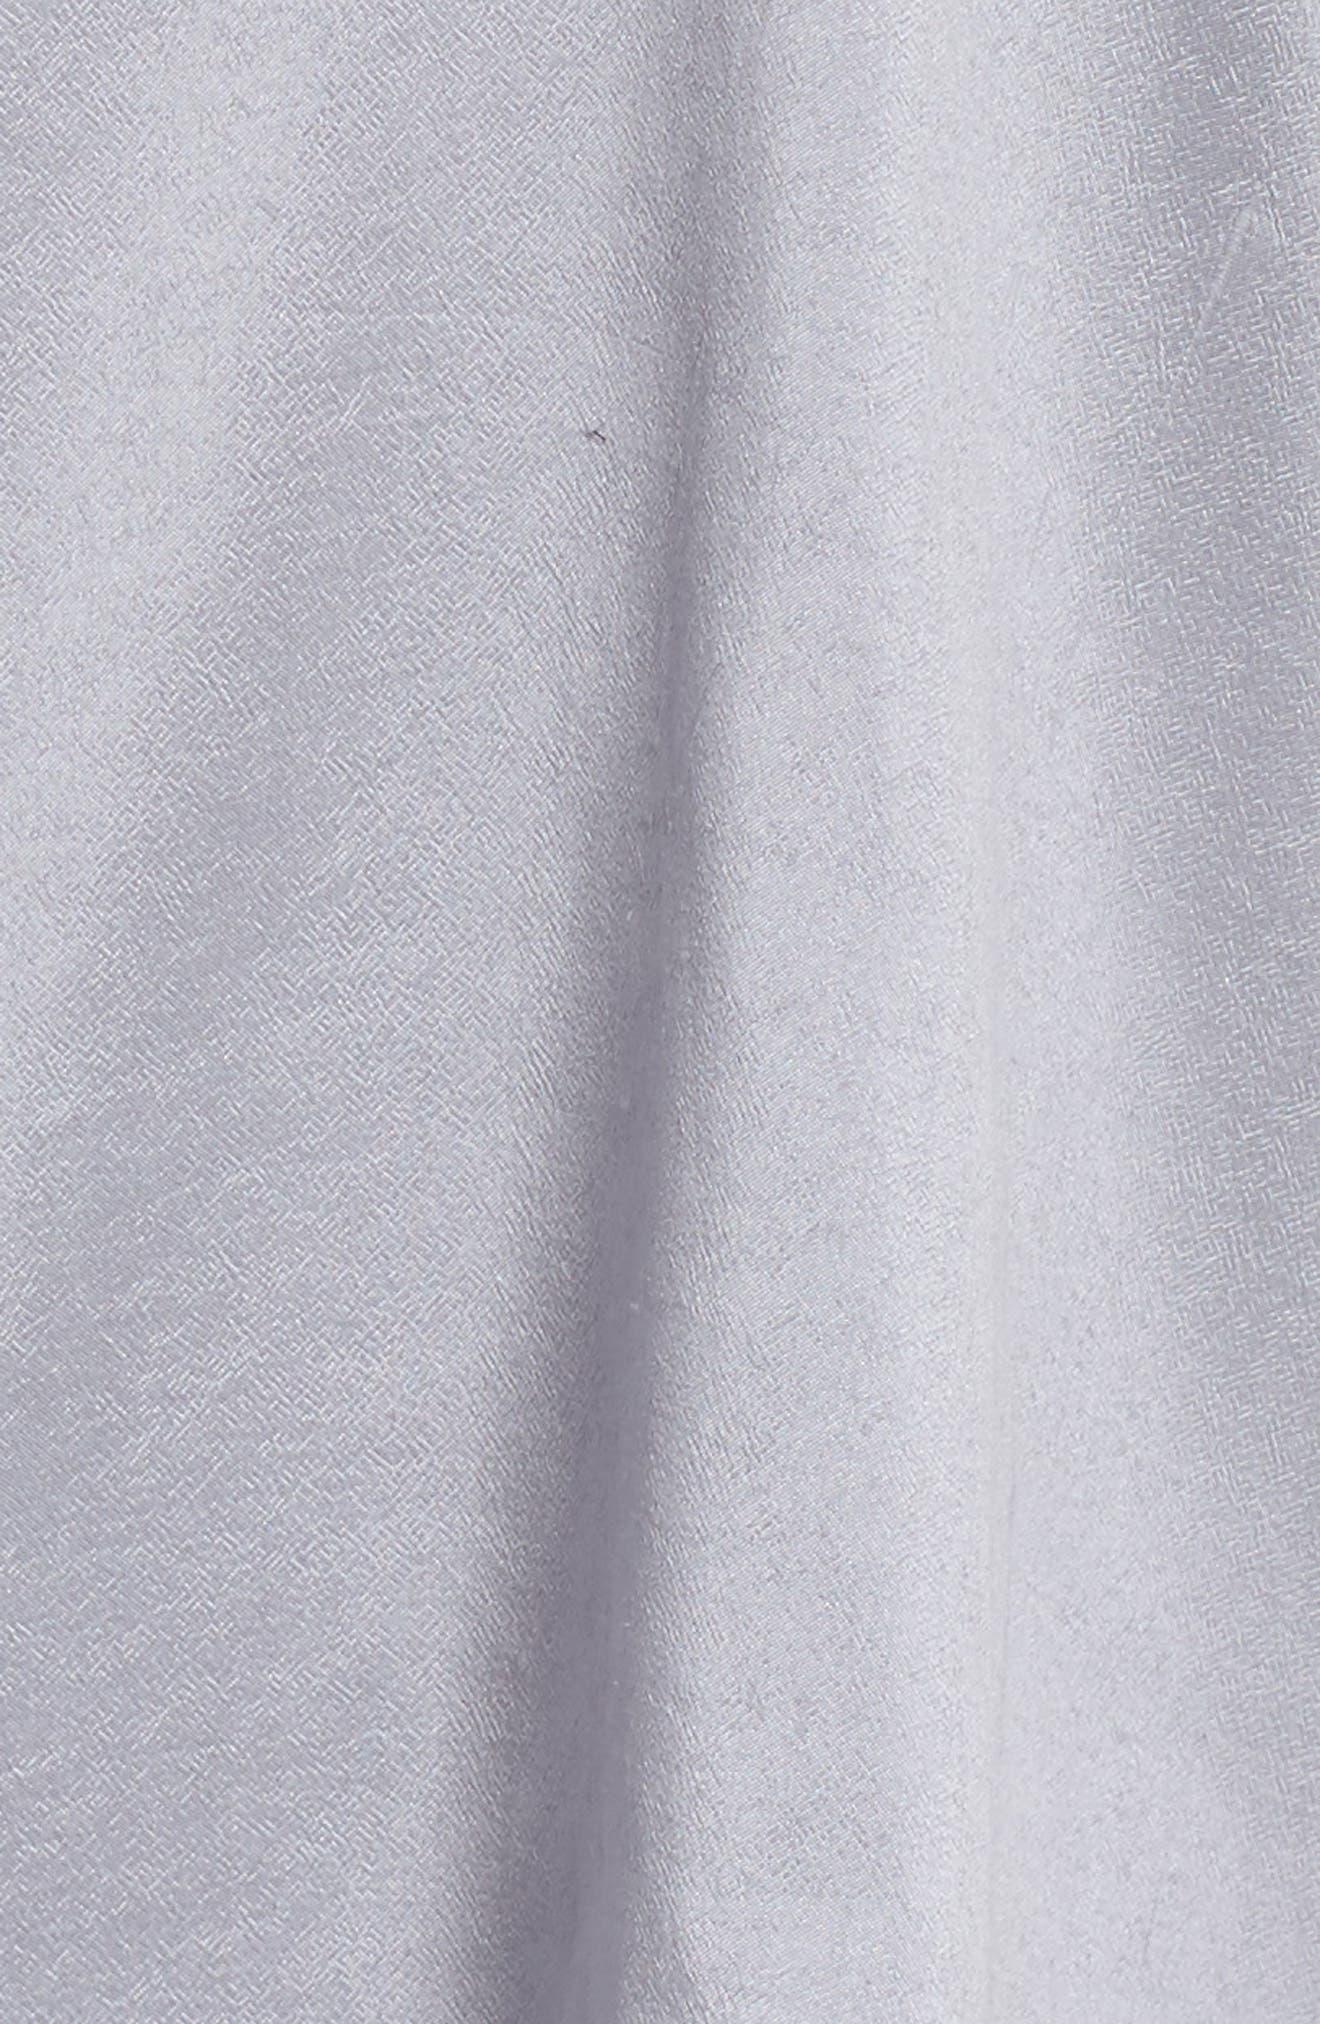 Notch Collar Shirt,                             Alternate thumbnail 9, color,